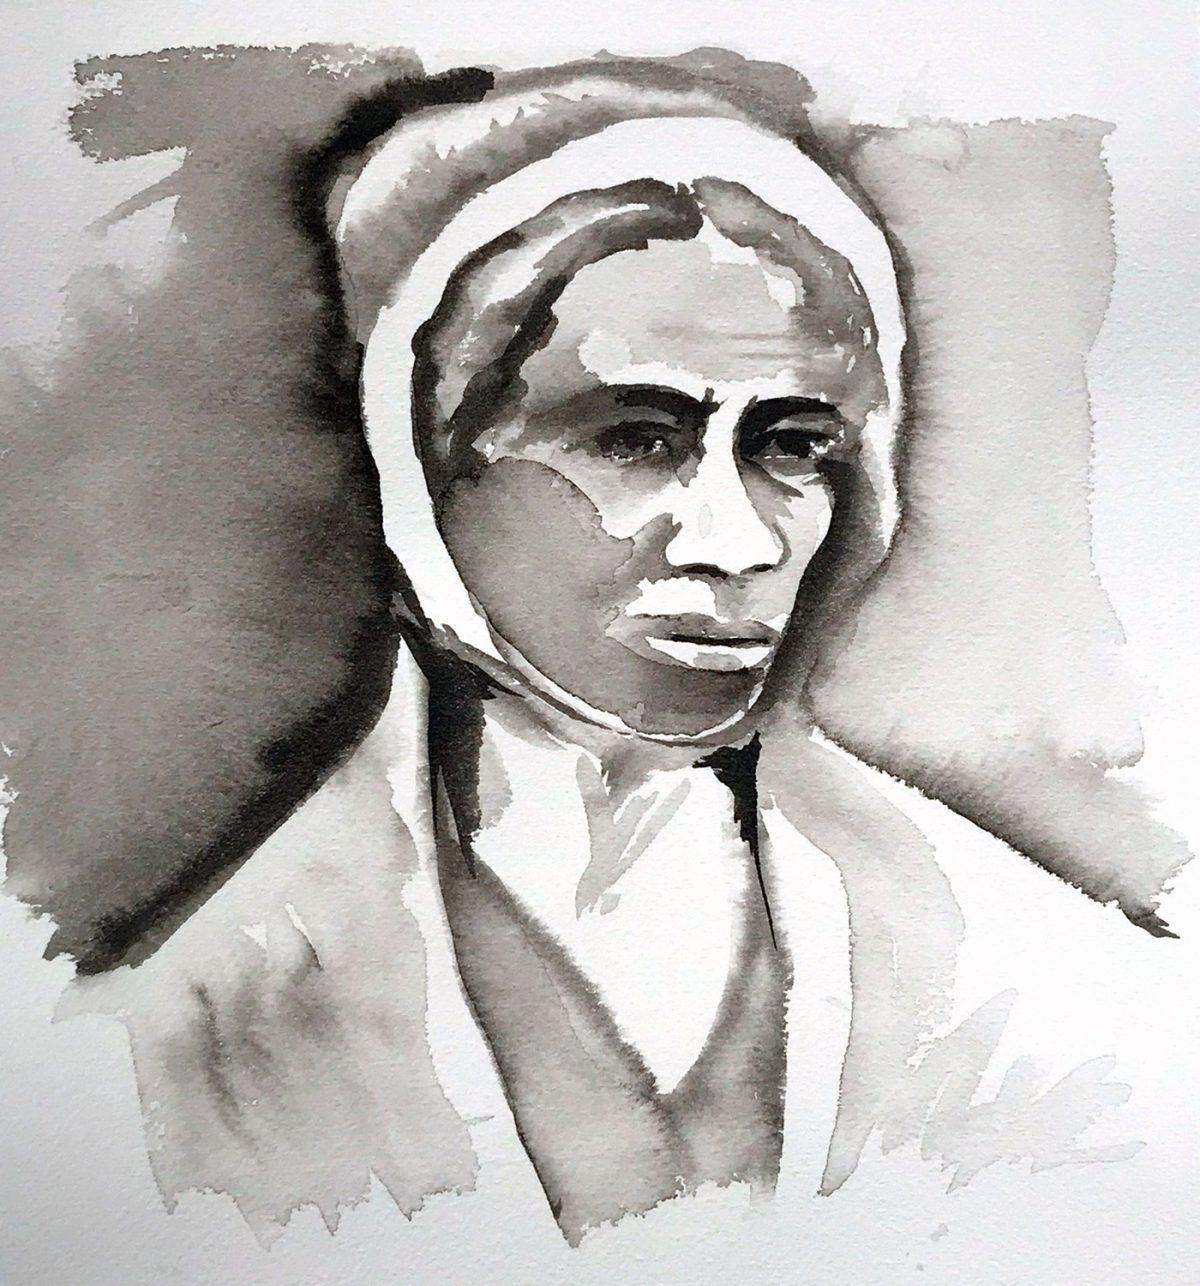 Sojourner-Truth-Indira-Cesarine-2019x-2-1200x1286.jpg